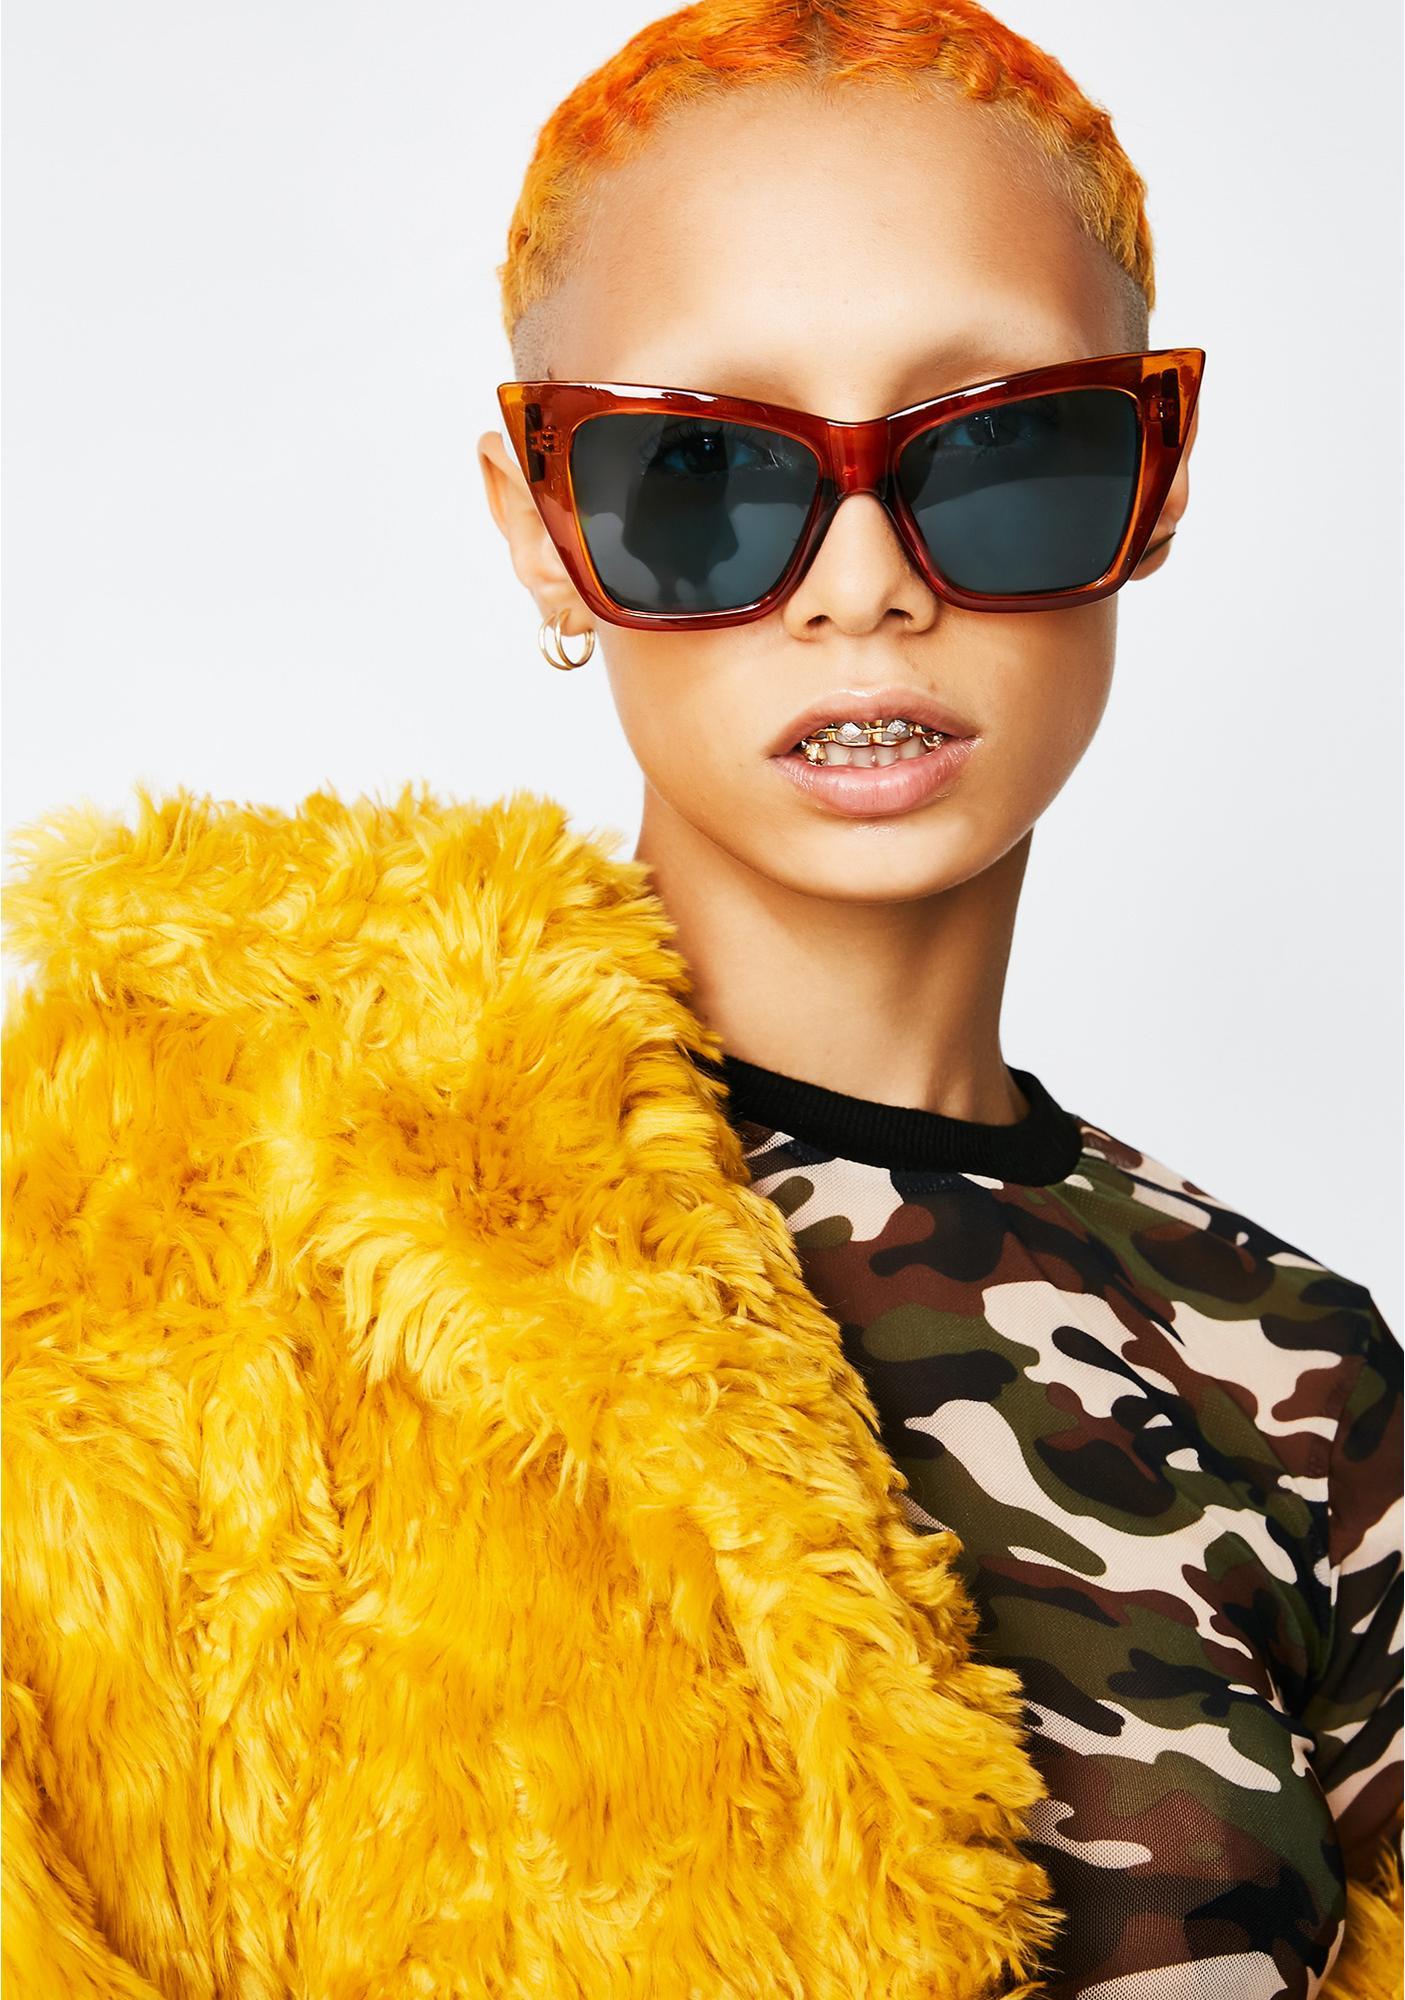 Crystal Vision Sunglasses